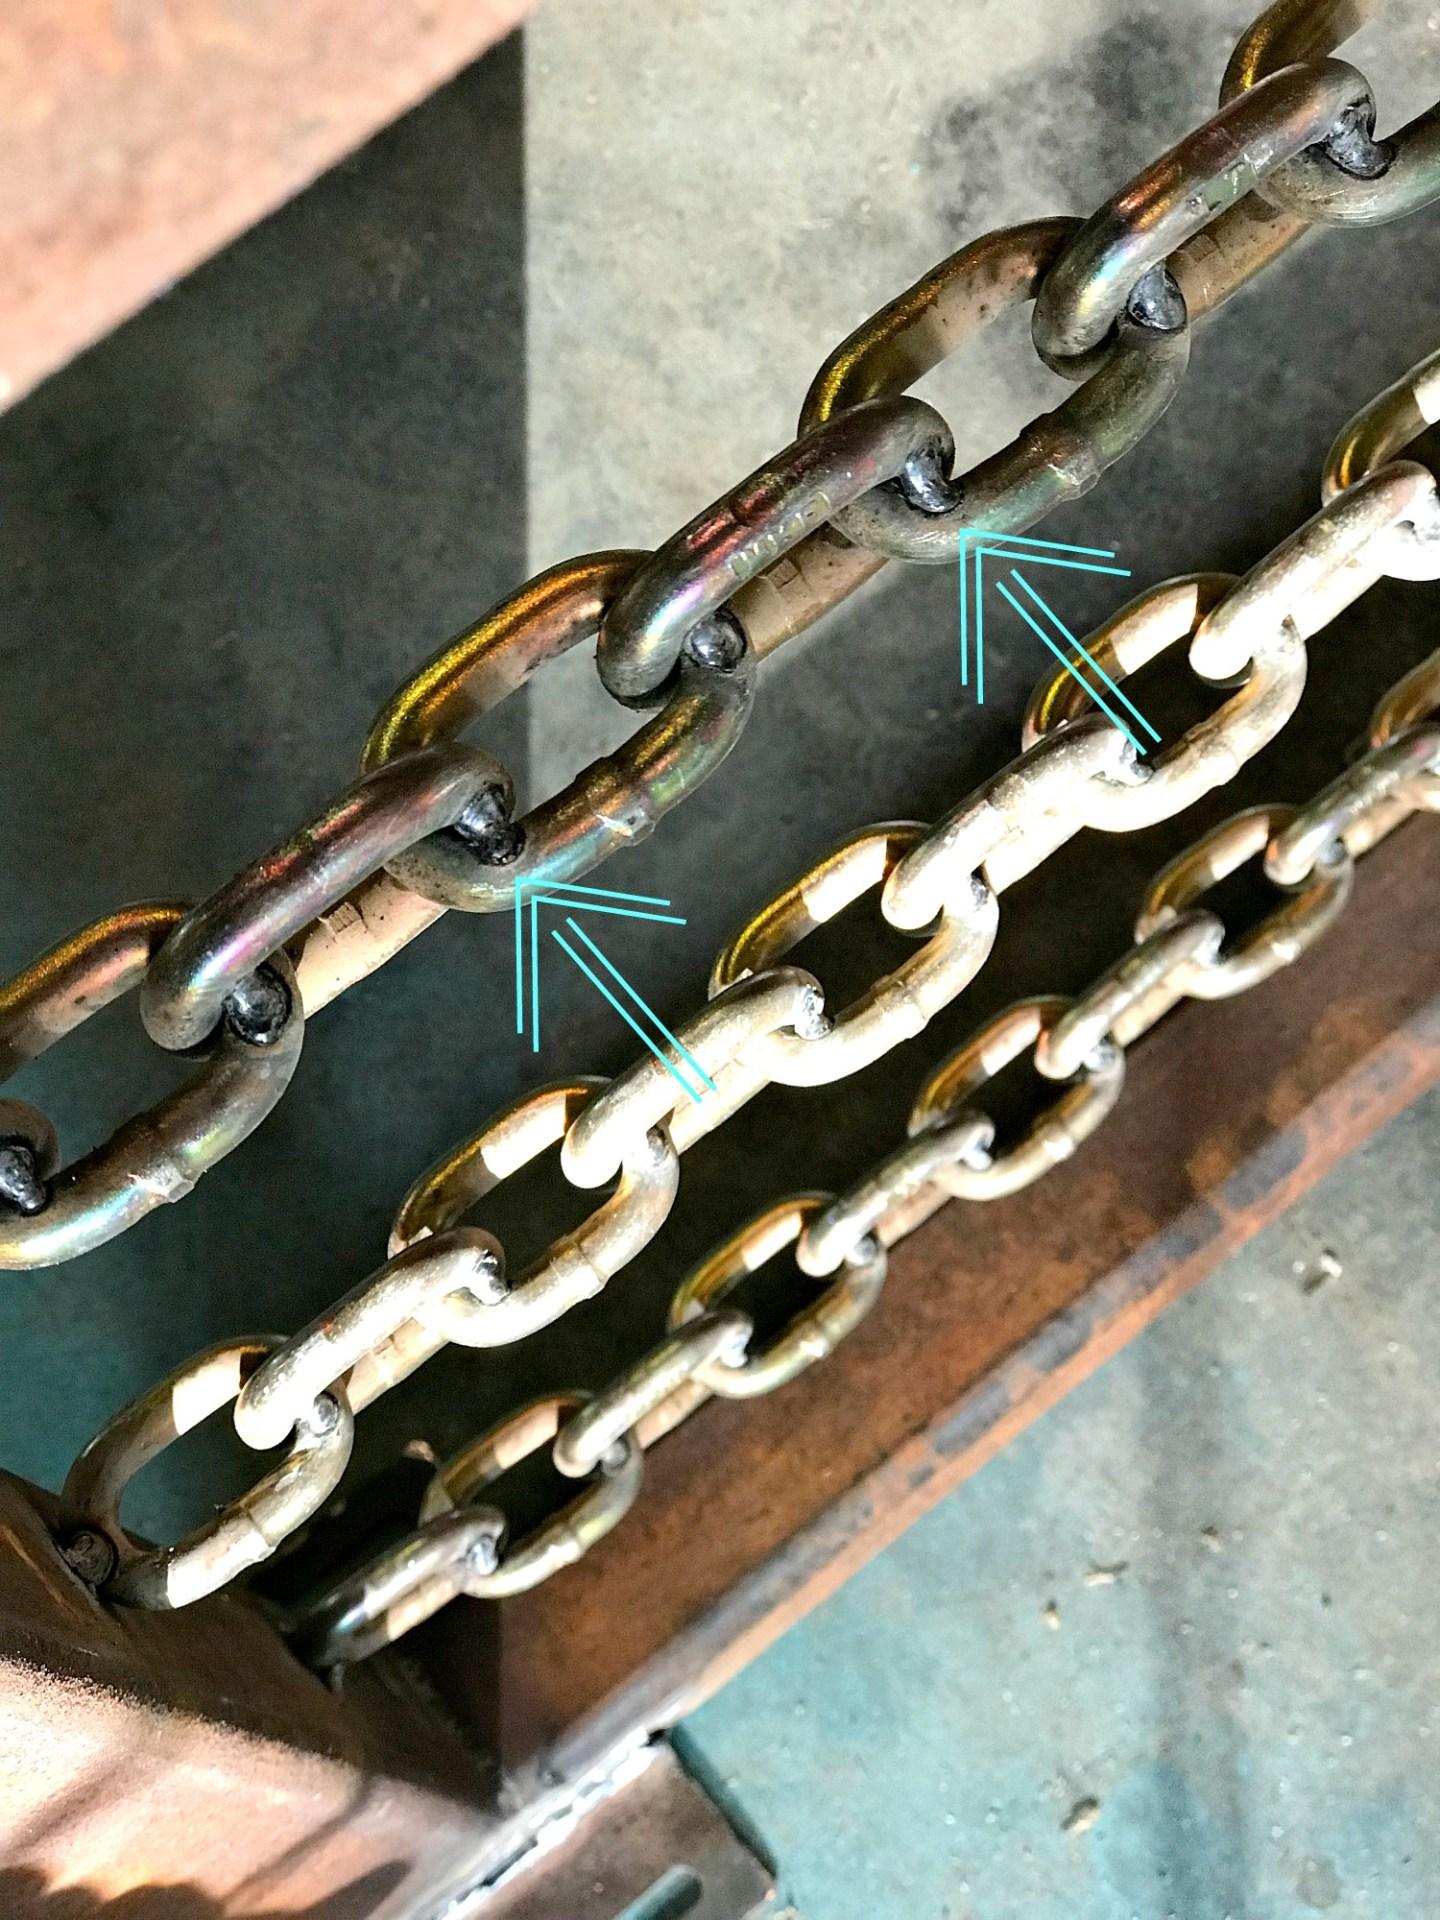 Welded Chain | Learn How to Weld Chain